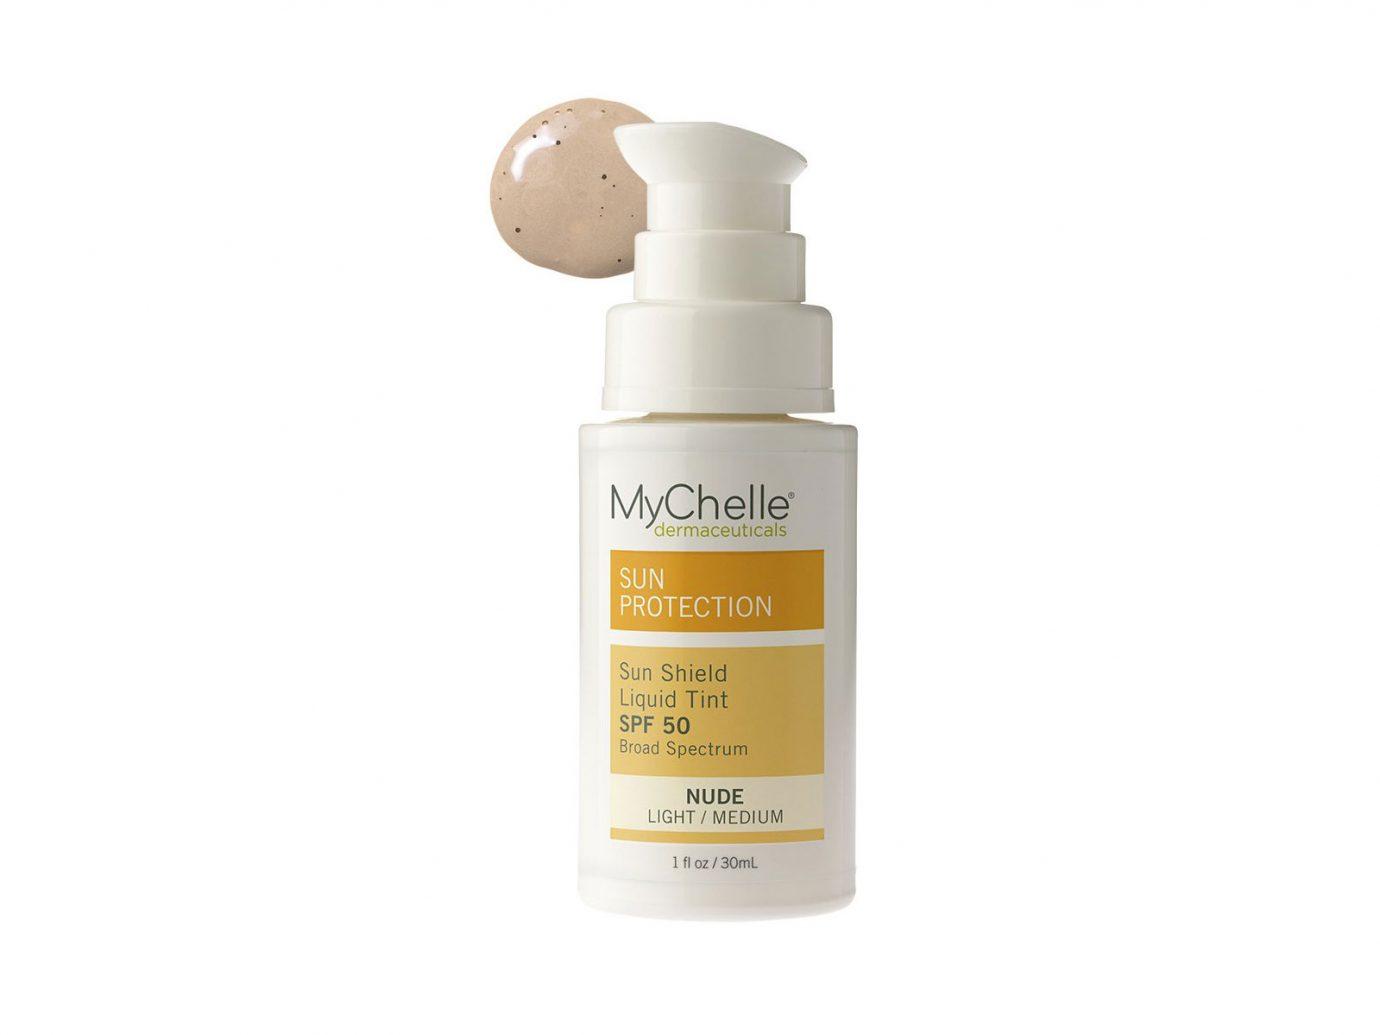 MyChelle Sun Shield Liquid Tint SPF 50